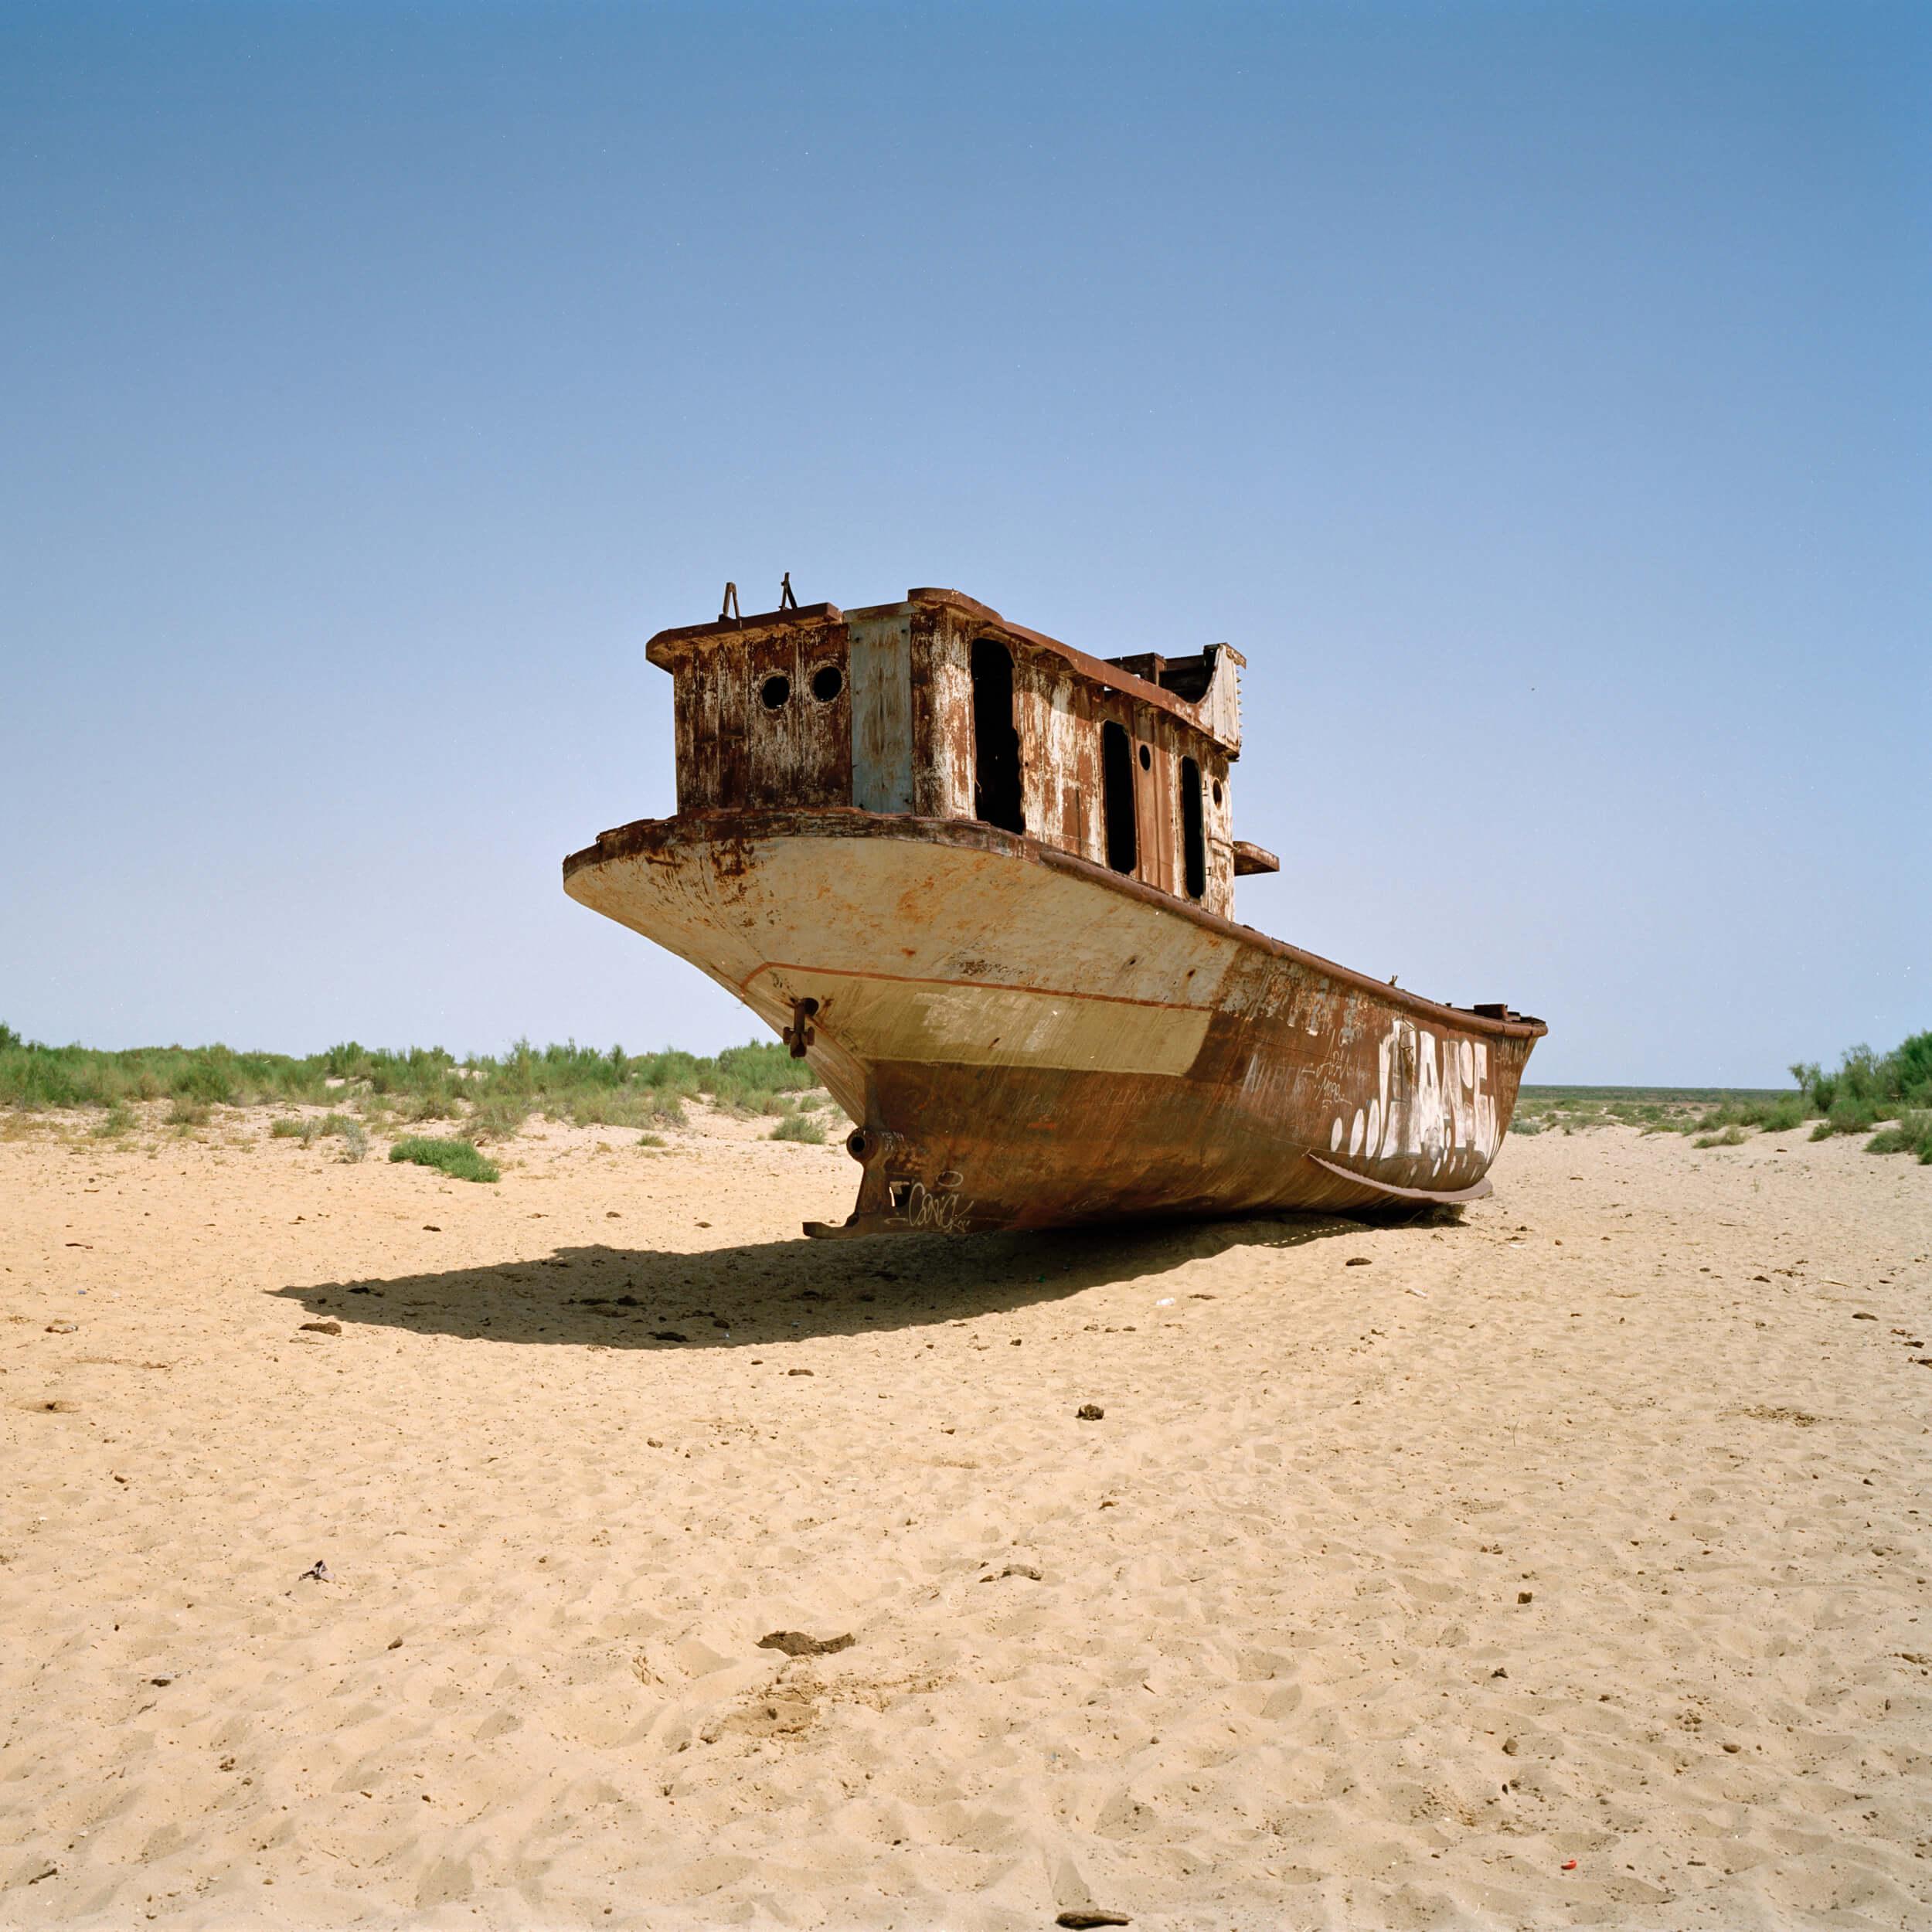 marco-barbieri-water-in-the-desert-51.jpg